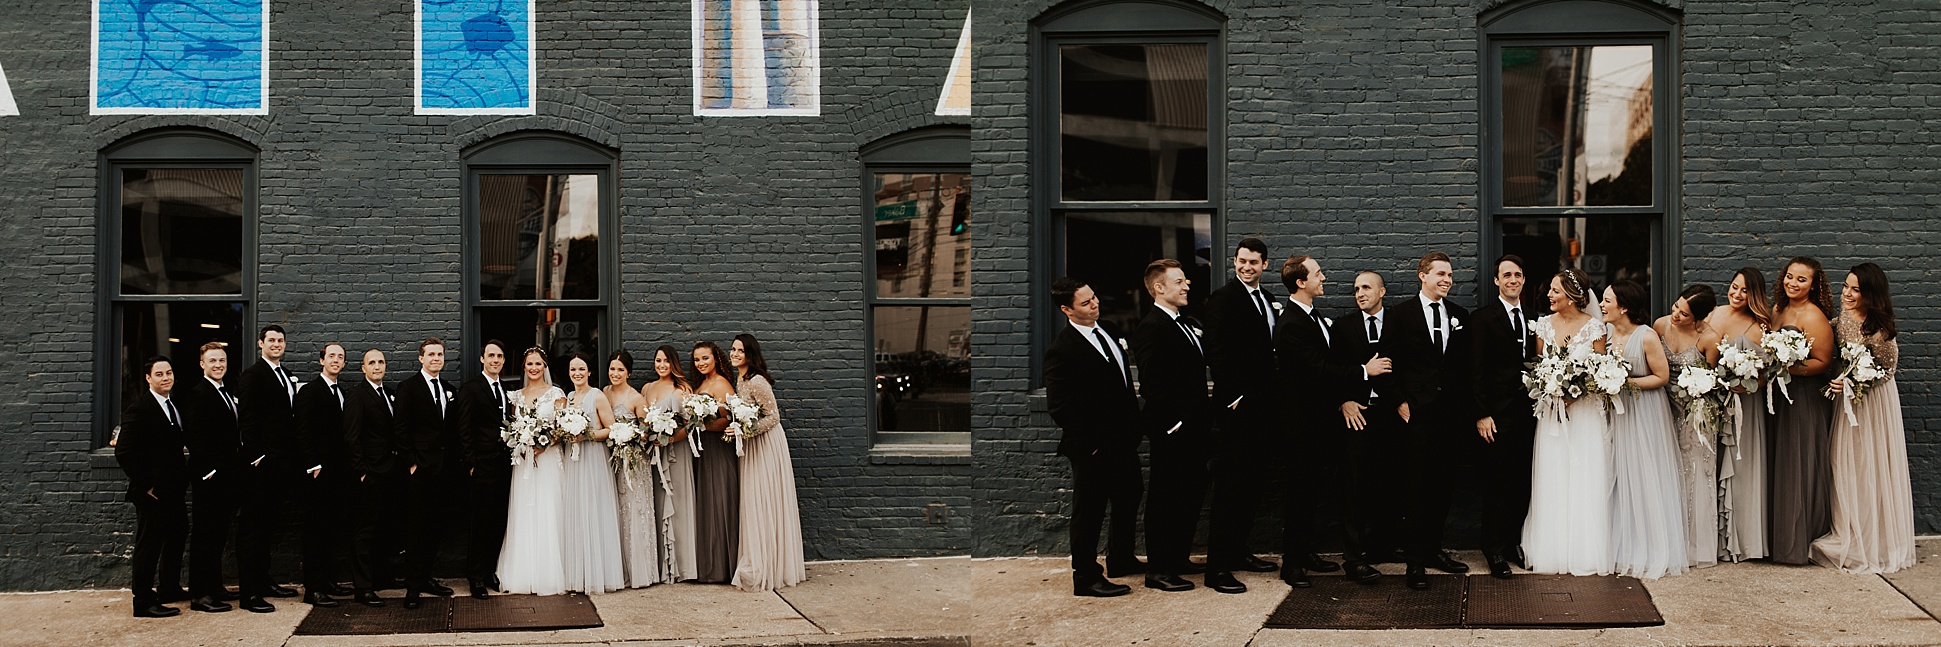 terminus_330_wedding_atlanta054.JPG